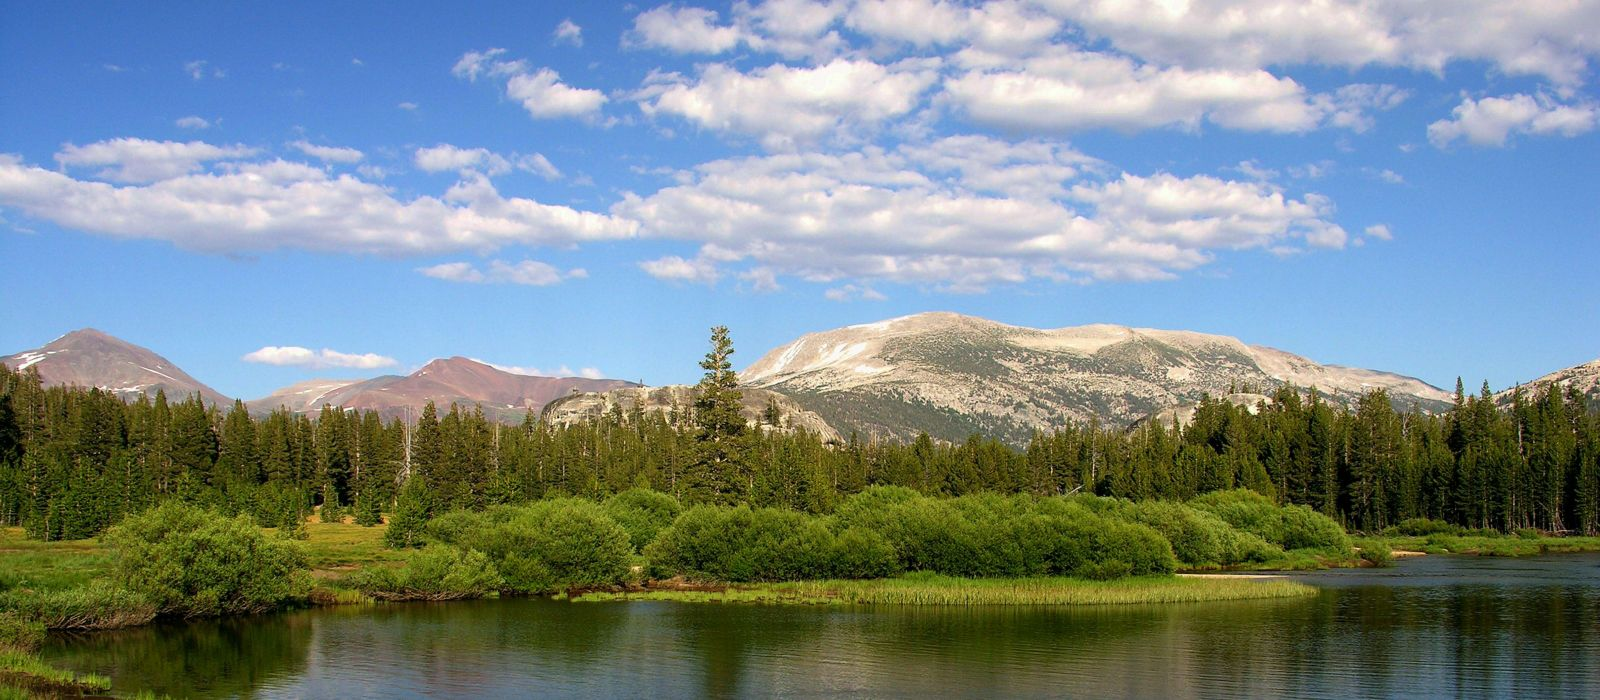 Tuolumne Meadows im Yosemite Nationalpark